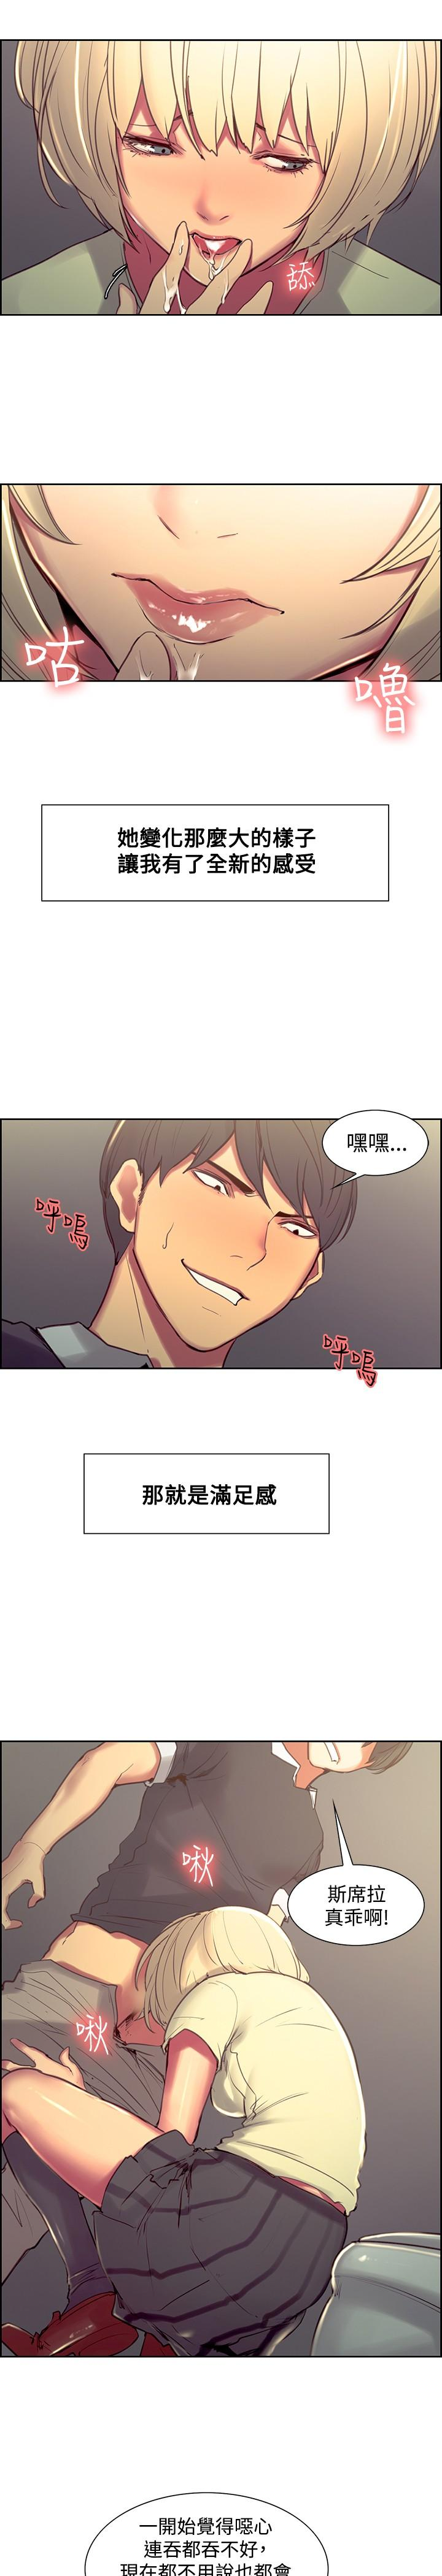 Domesticate the Housekeeper 调教家政妇 Ch.29~39 22